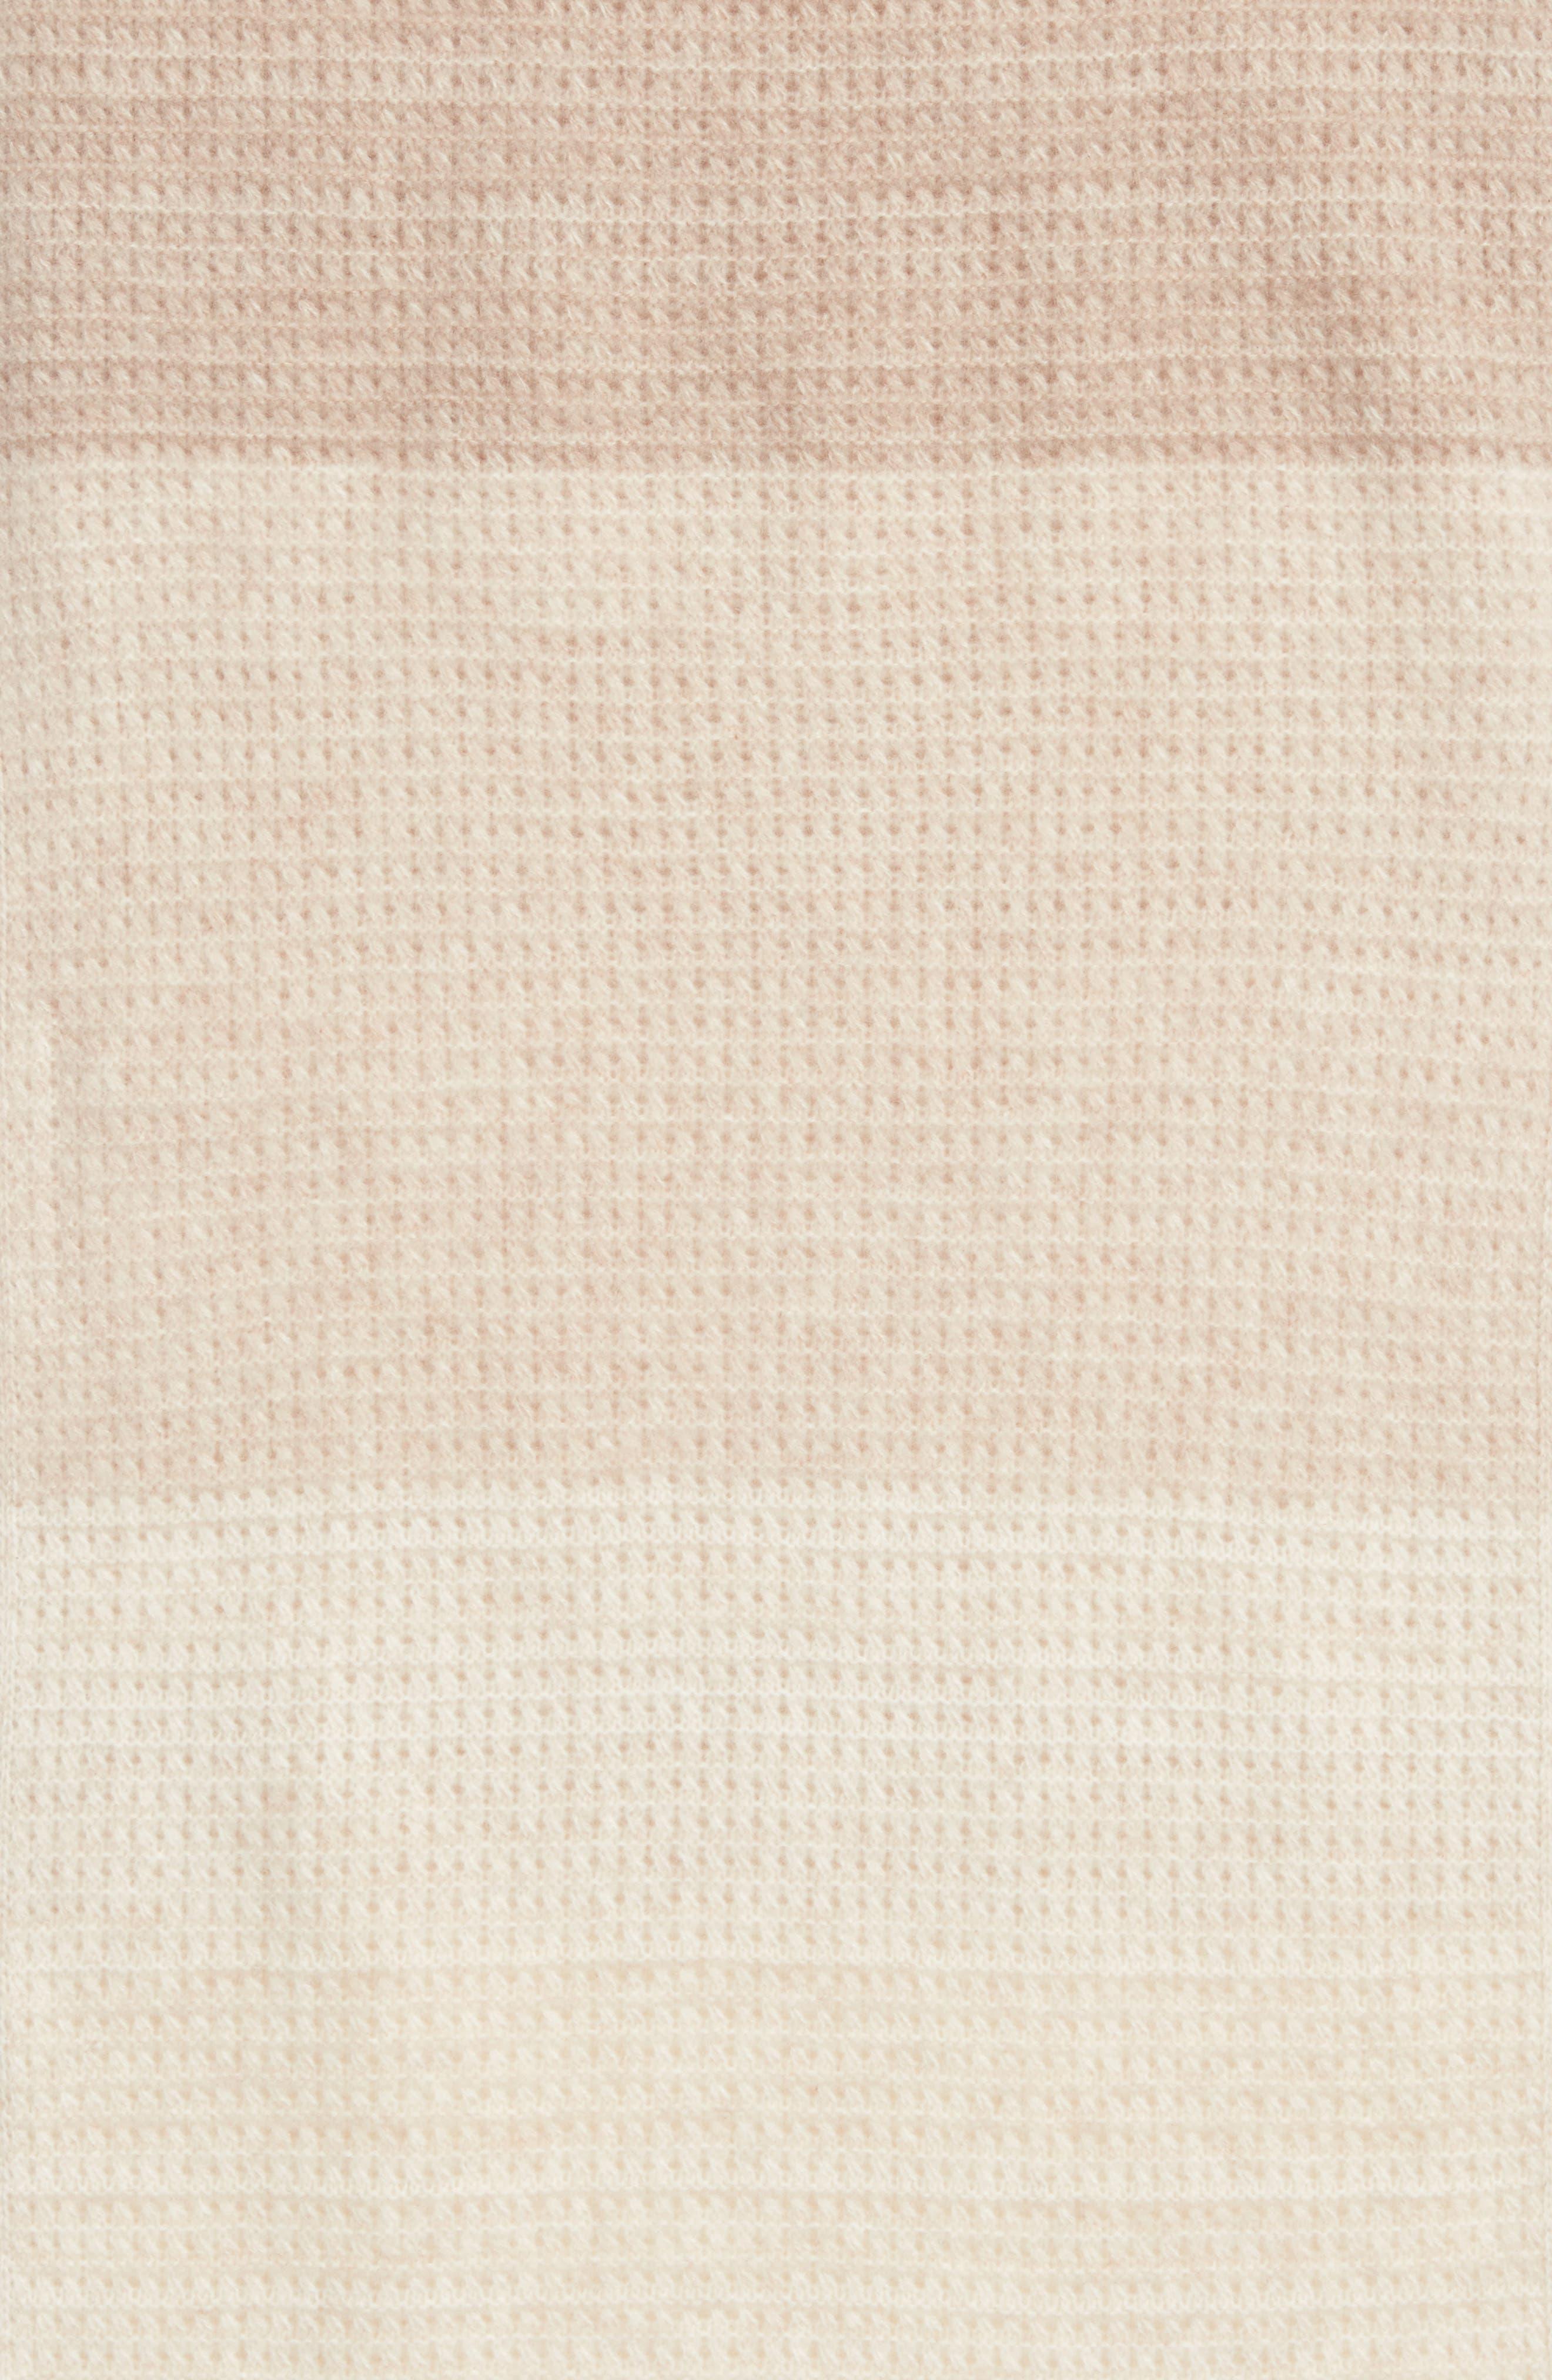 Ombré Cashmere Infinity Scarf,                             Alternate thumbnail 14, color,